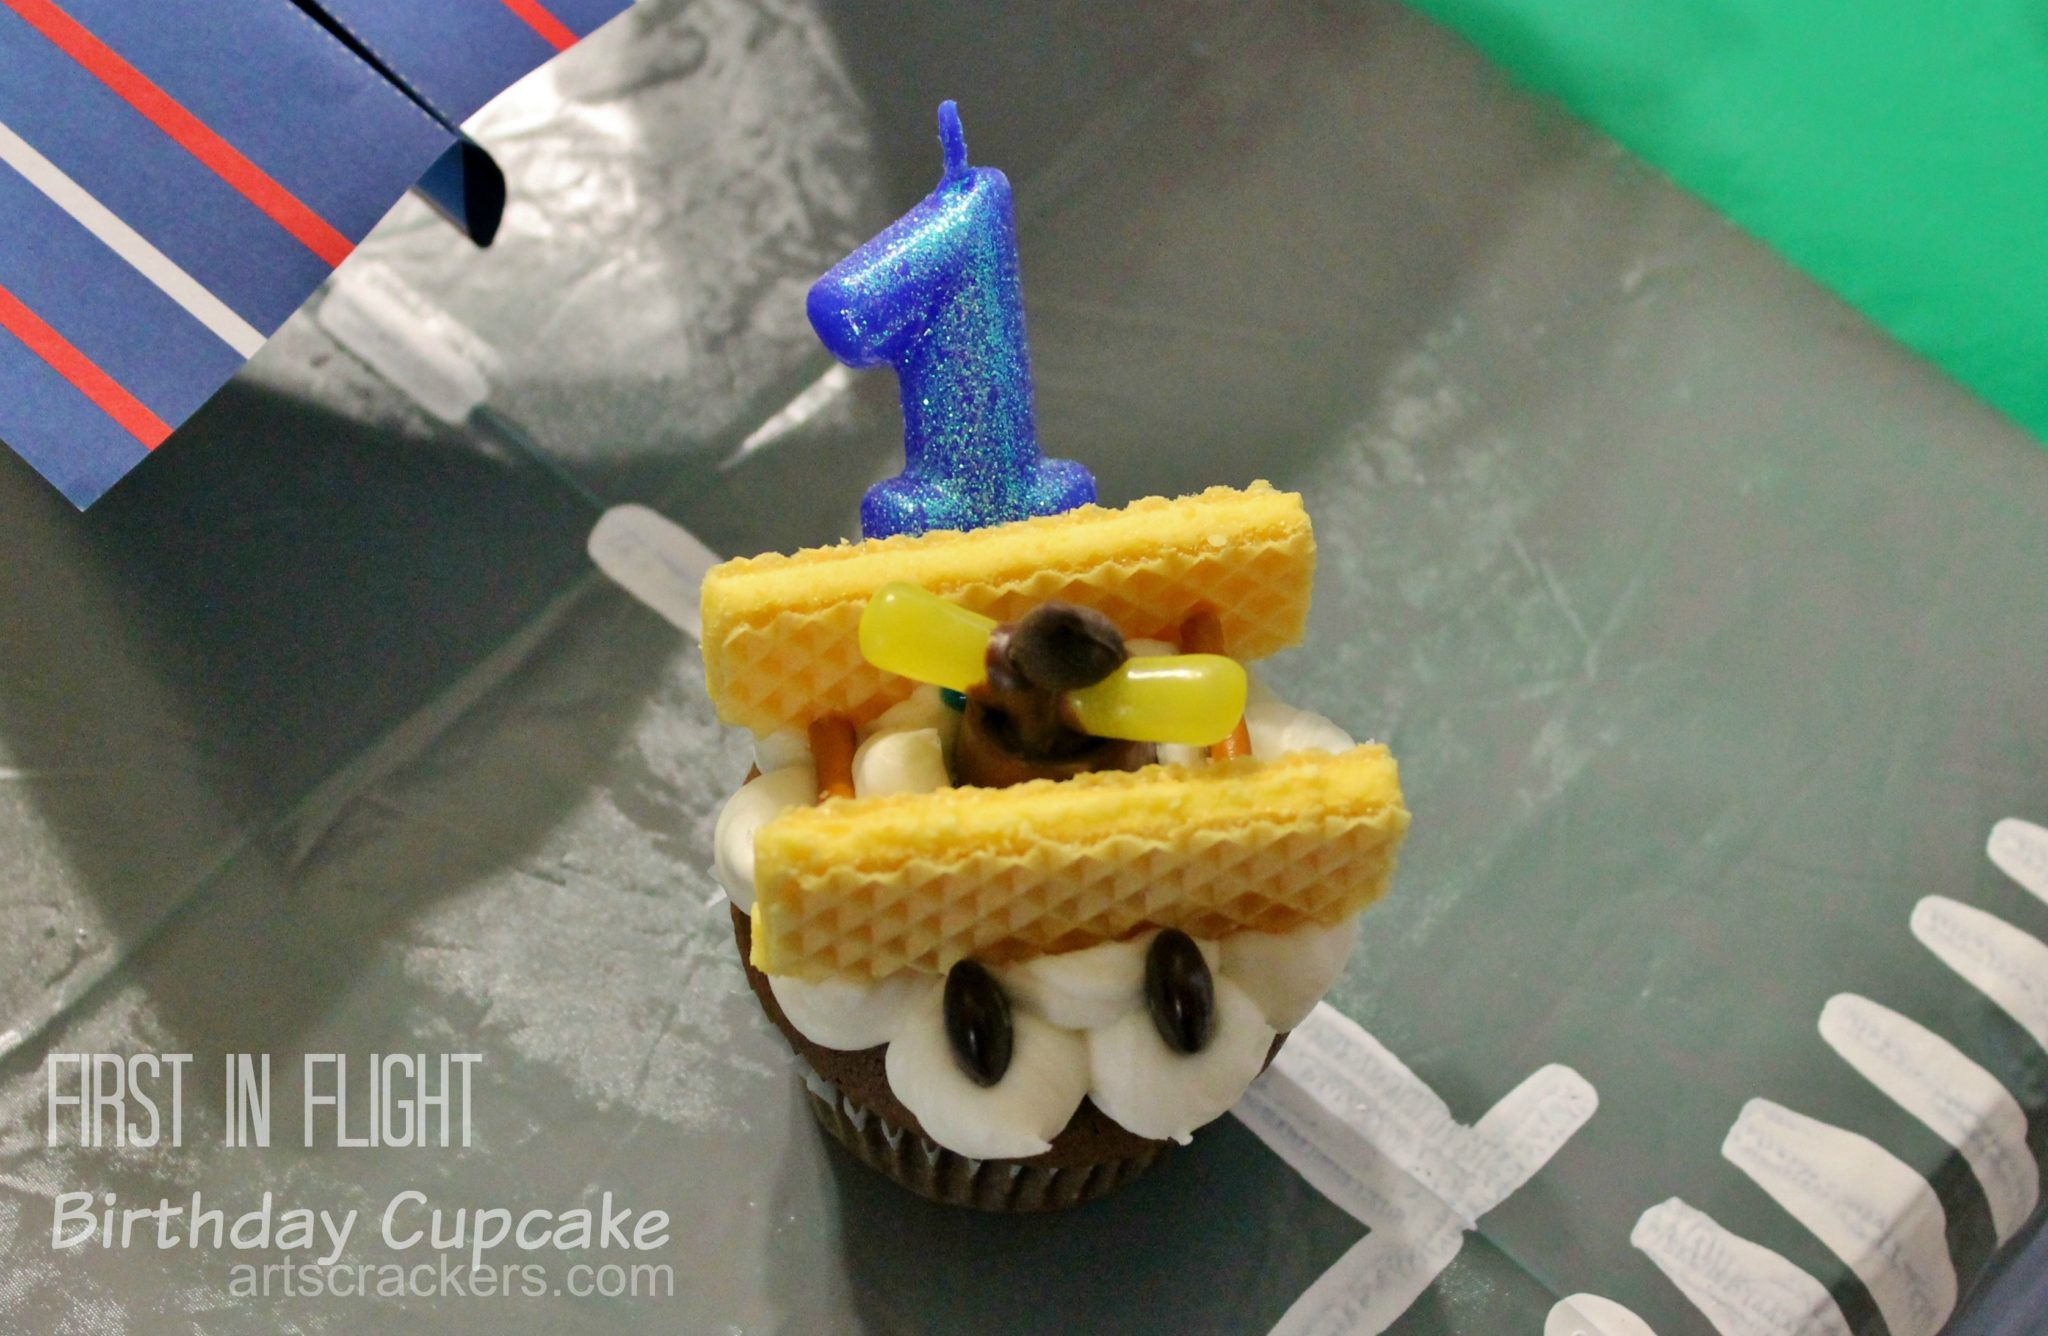 First in Flight Birthday Cupcake